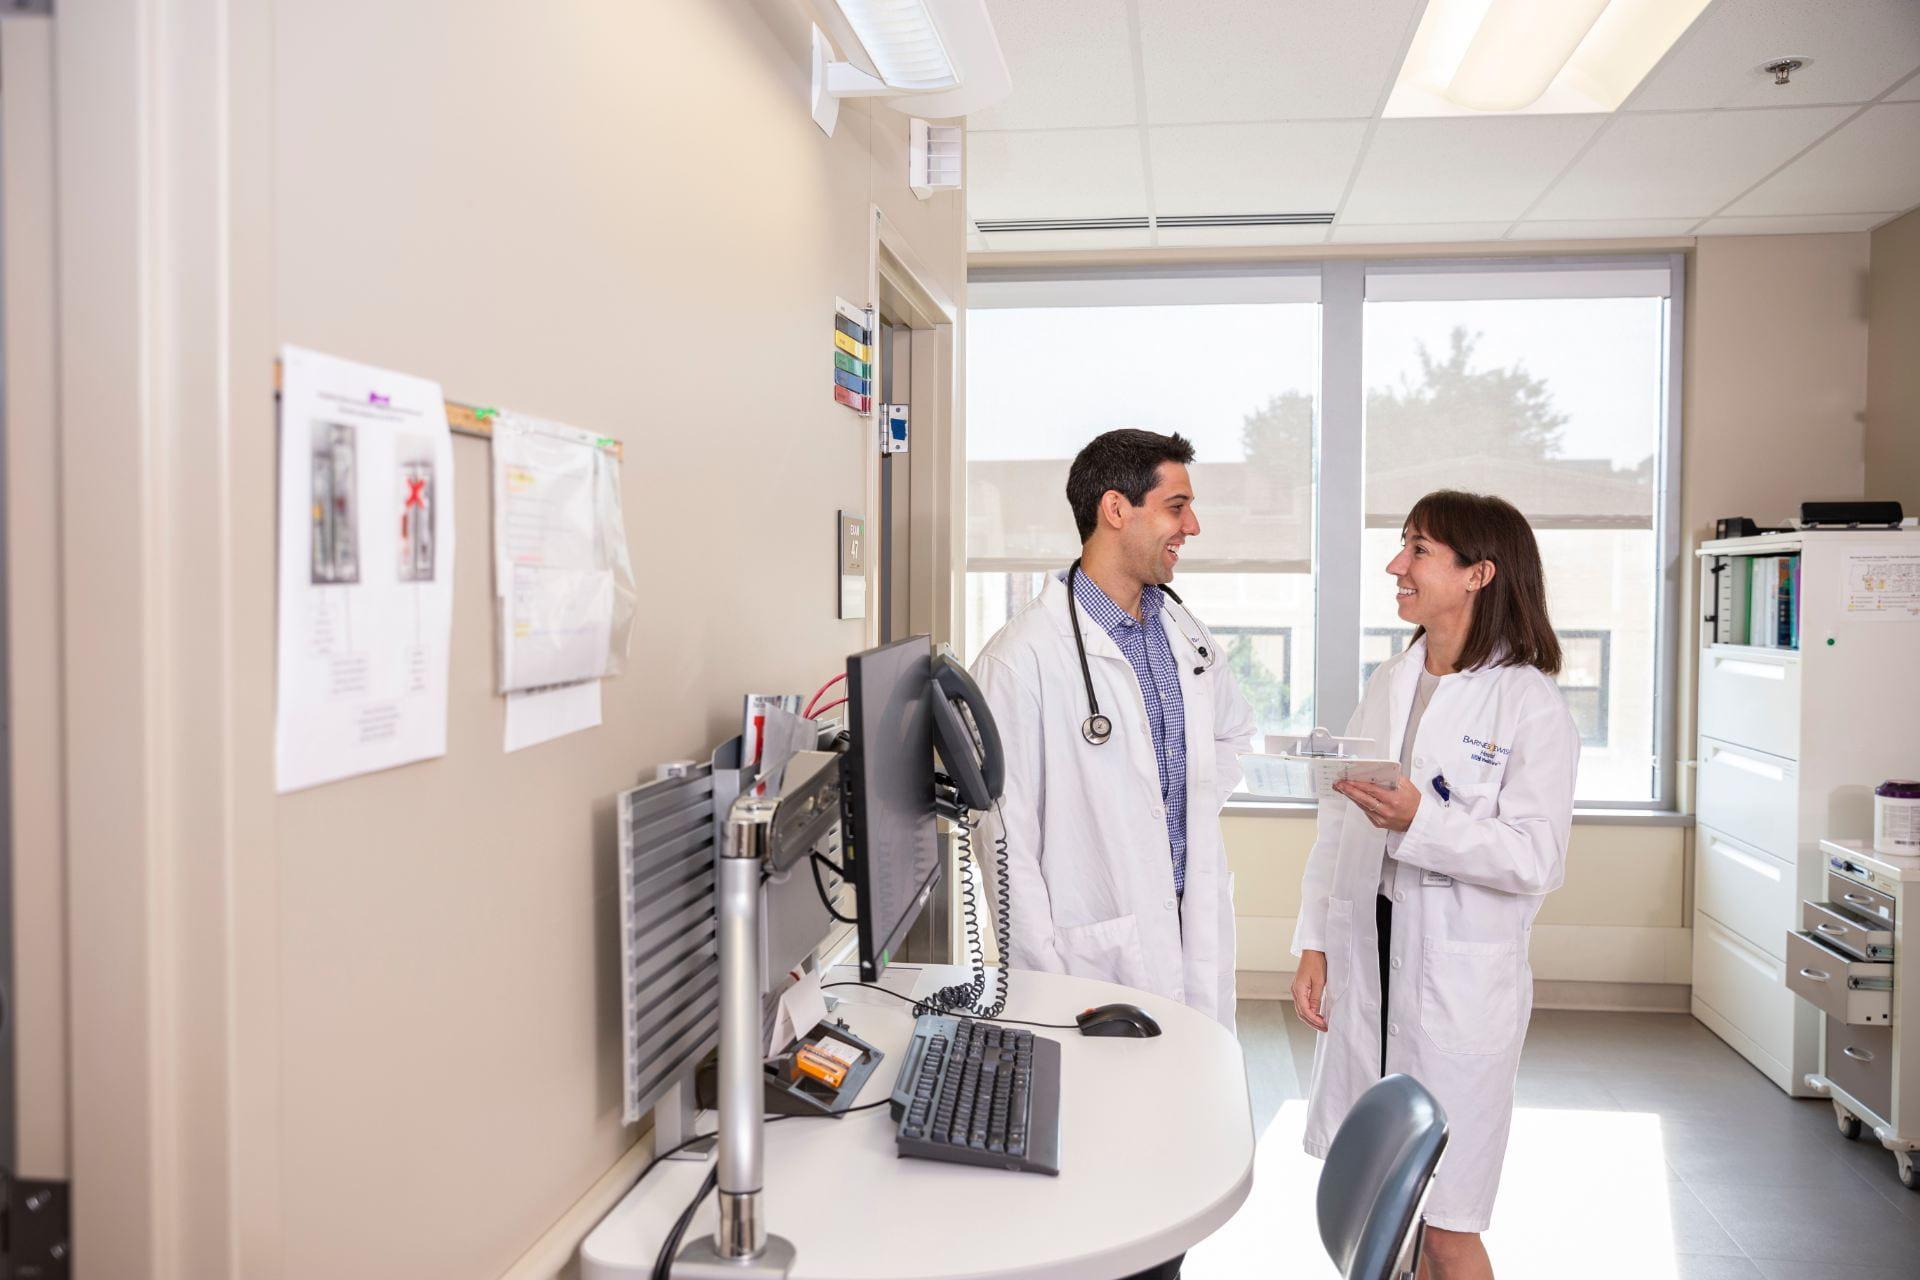 Left to Right: Jason Ross, MD & Stephanie Socias, MD